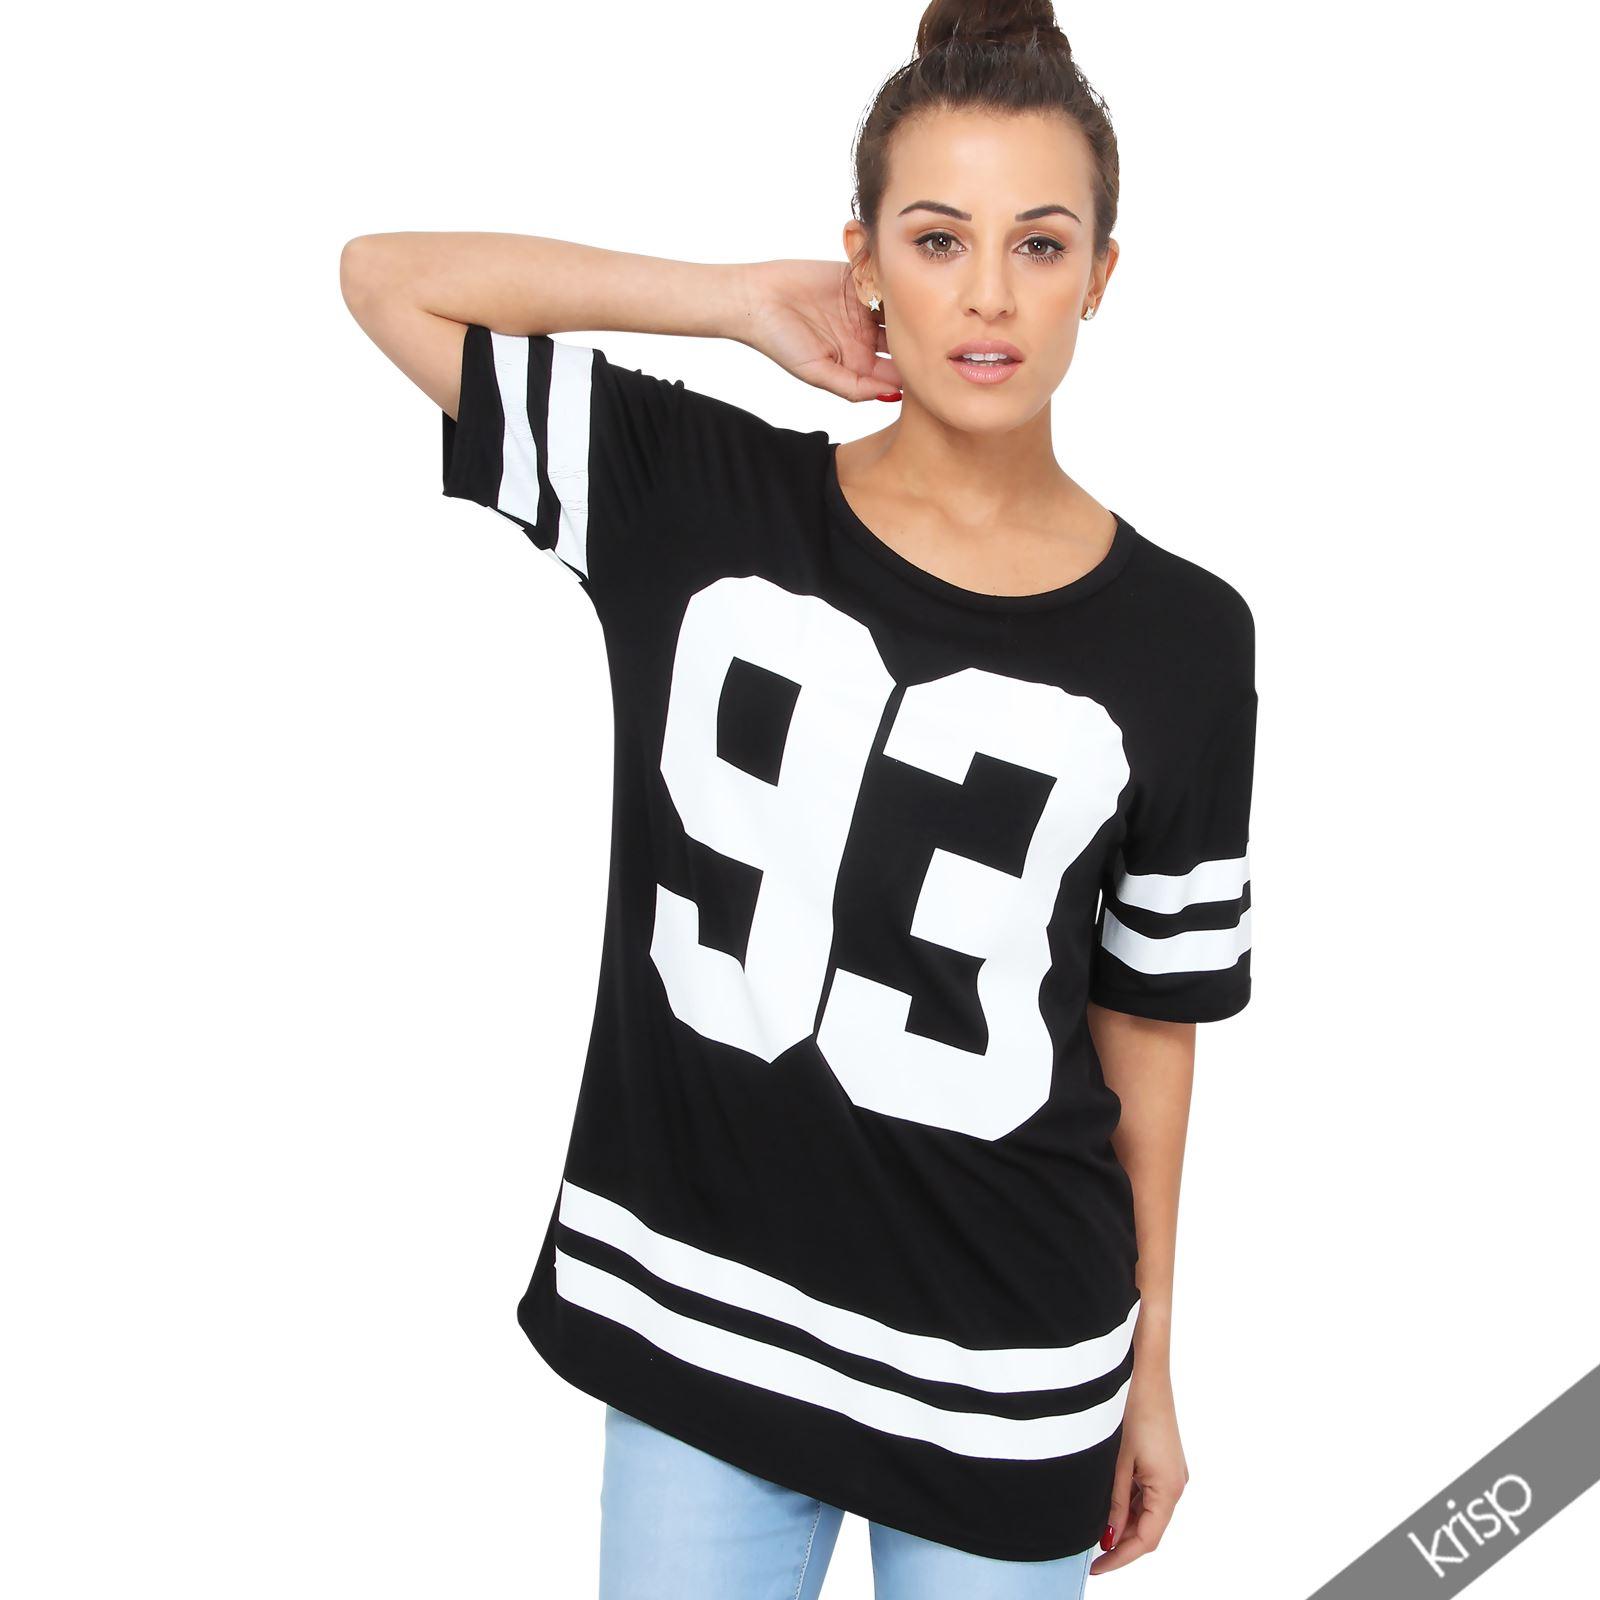 womens baseball top american football player 93 varsity jersey shirt plus size ebay. Black Bedroom Furniture Sets. Home Design Ideas